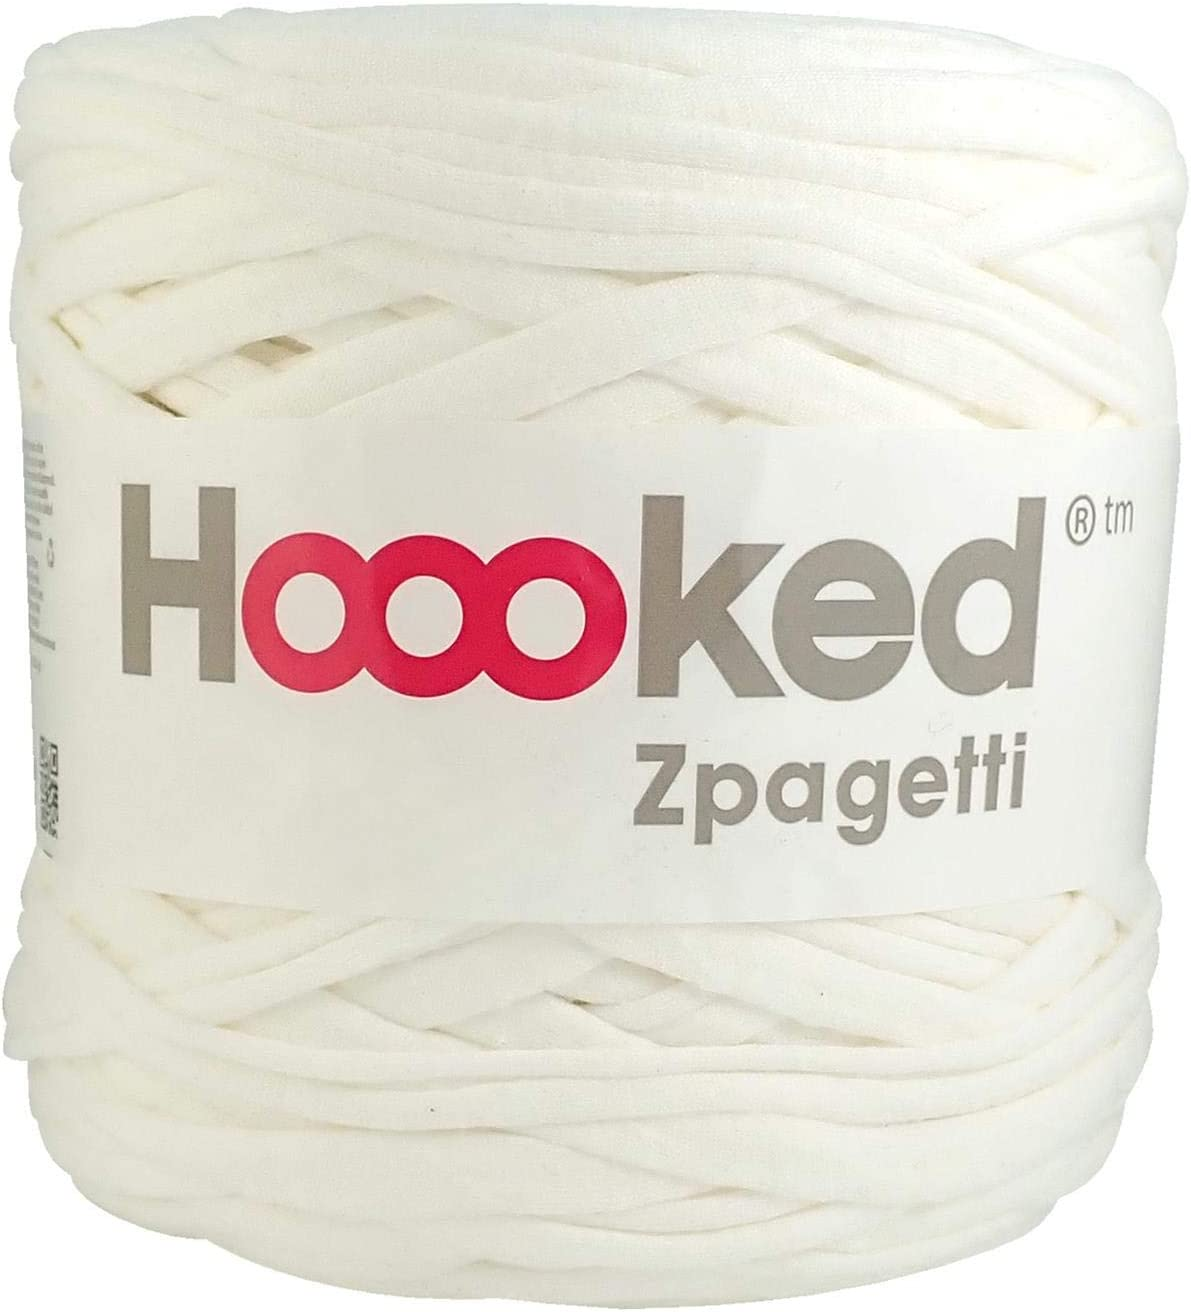 Hoooked Zpagetti T-Shirt-Garn 120/m 700/g Baumwolle wei/ß